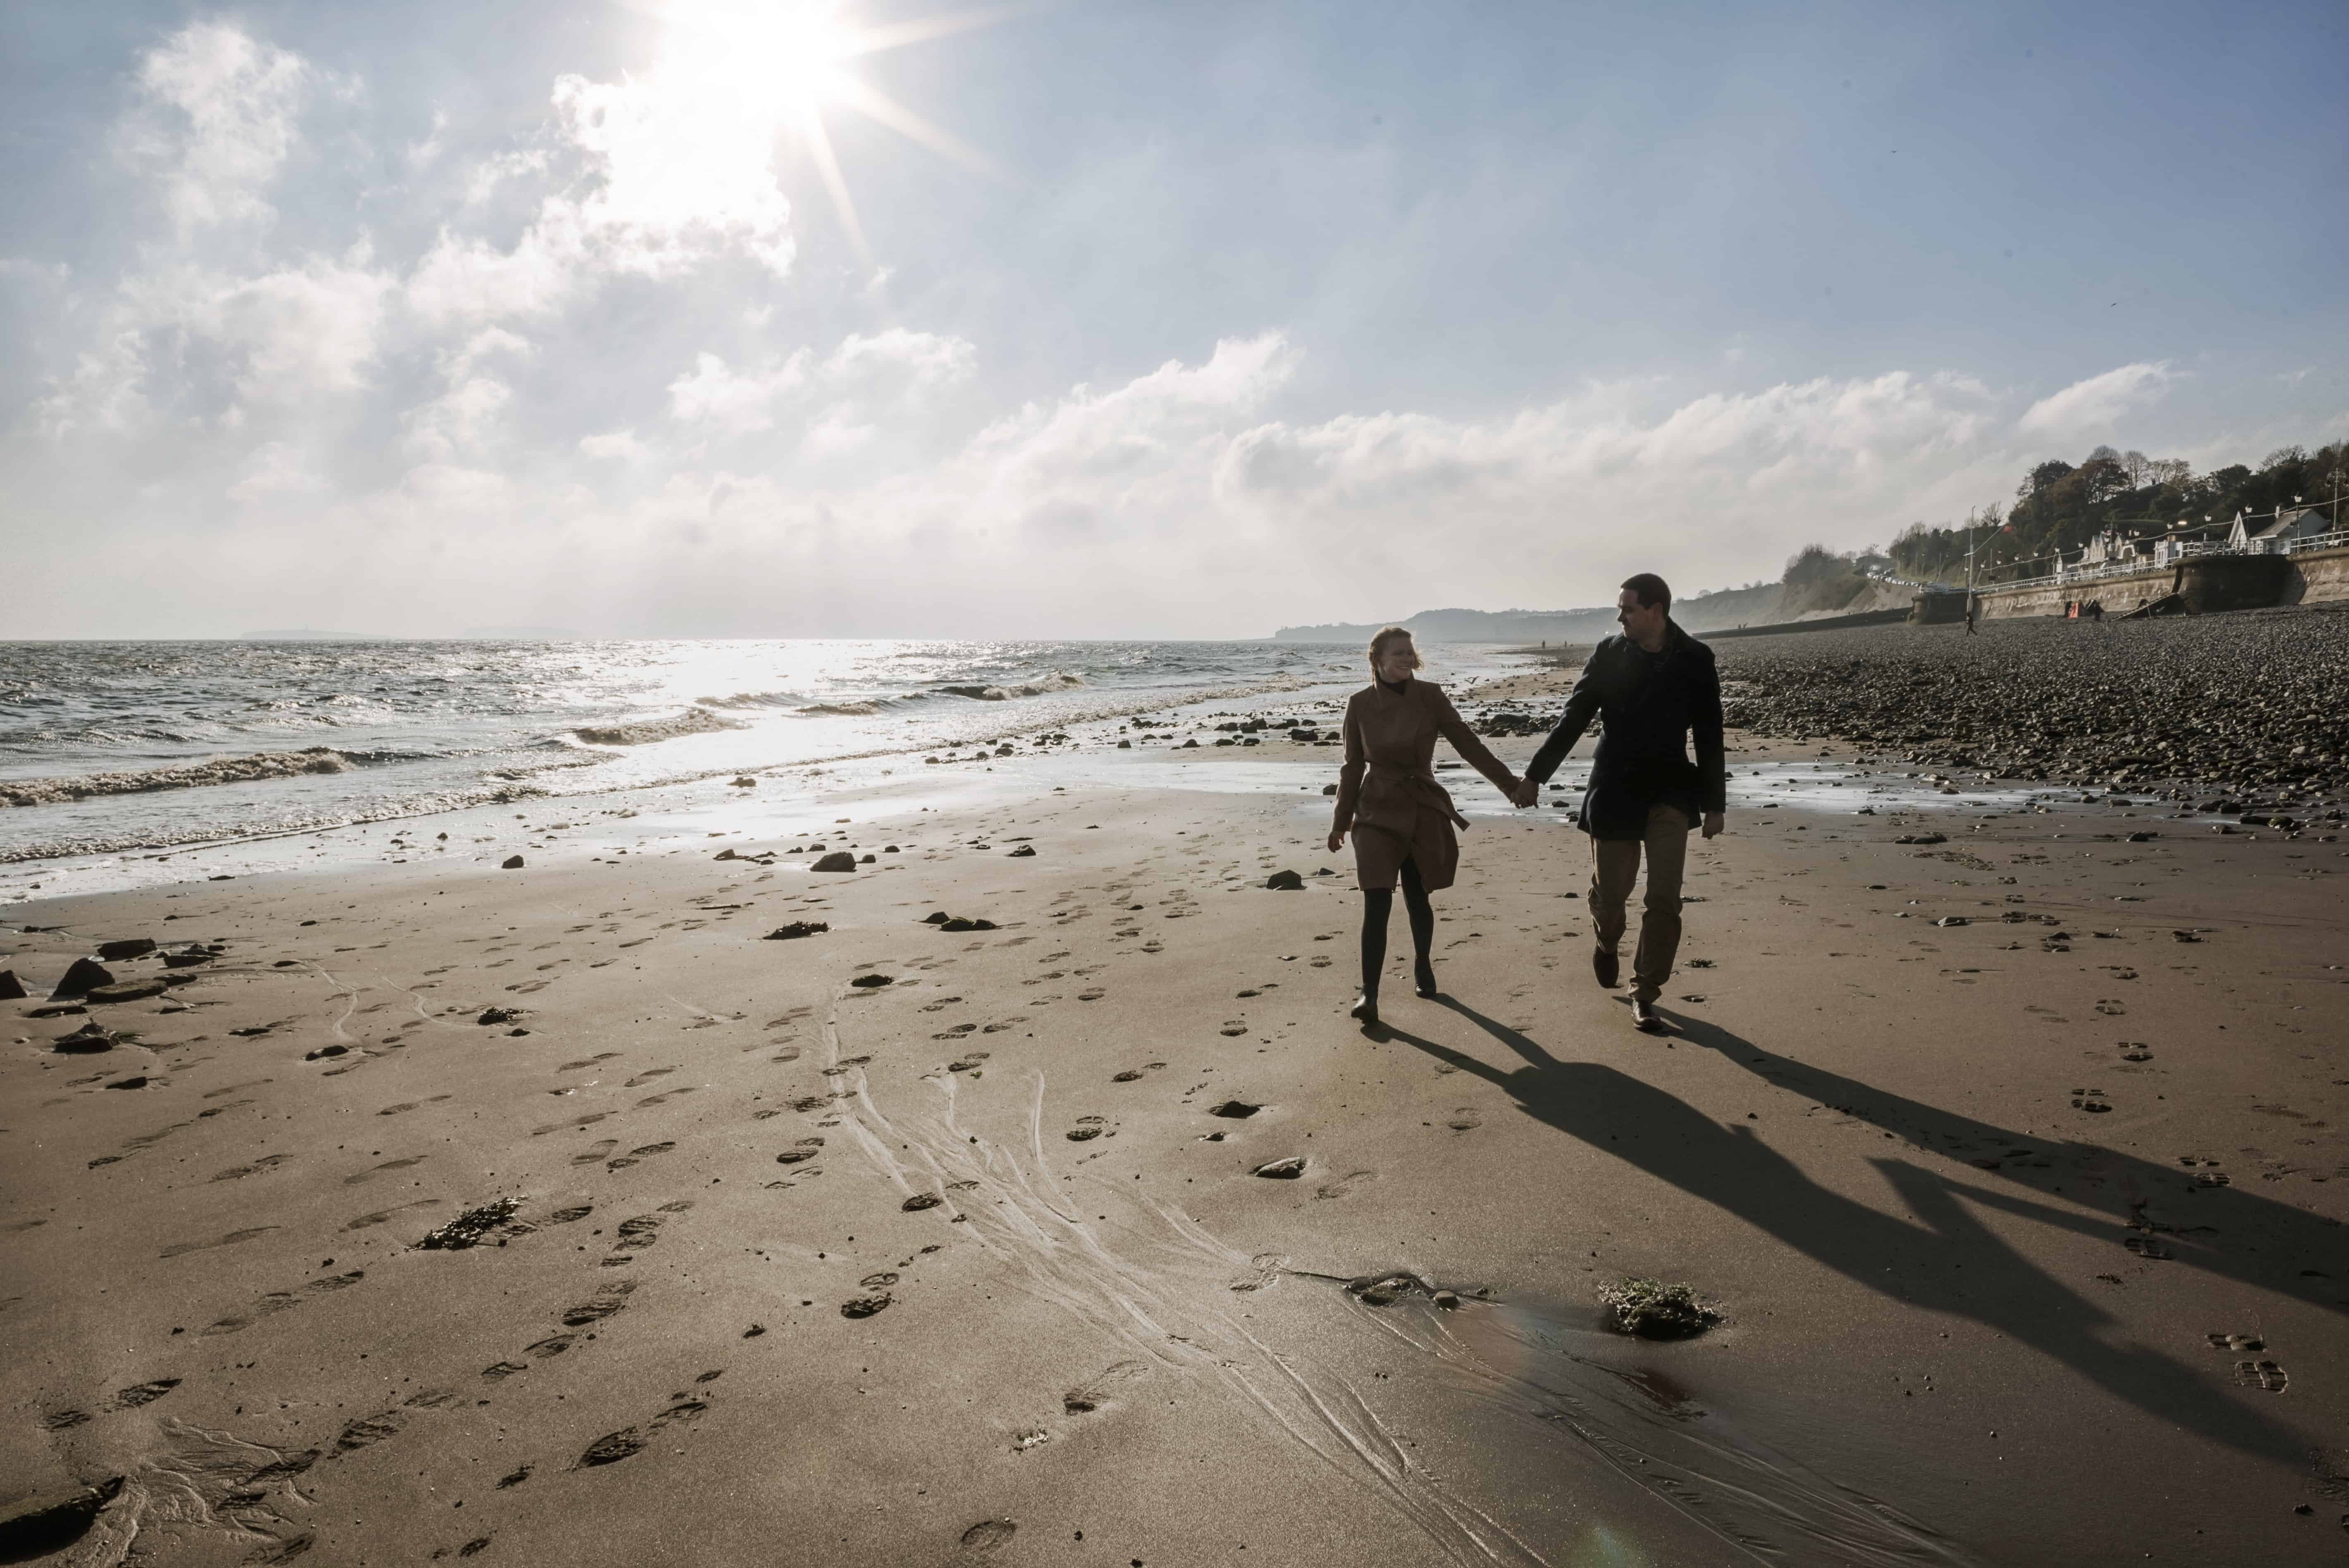 Couple walking on a sandy beach